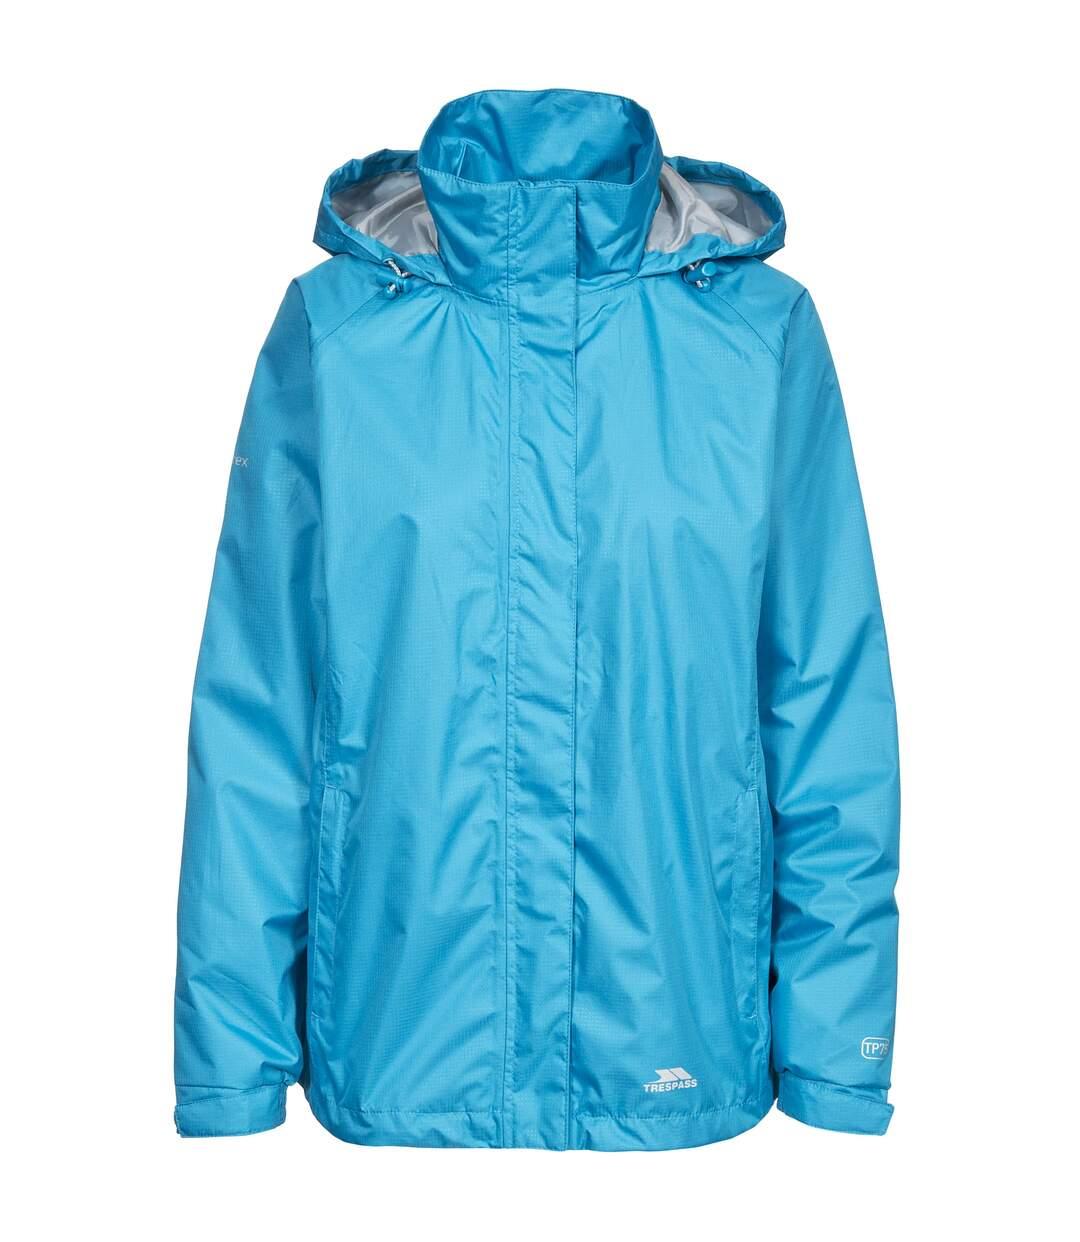 Trespass Womens/Ladies Lanna II Waterproof Jacket (Bermuda) - UTTP3279